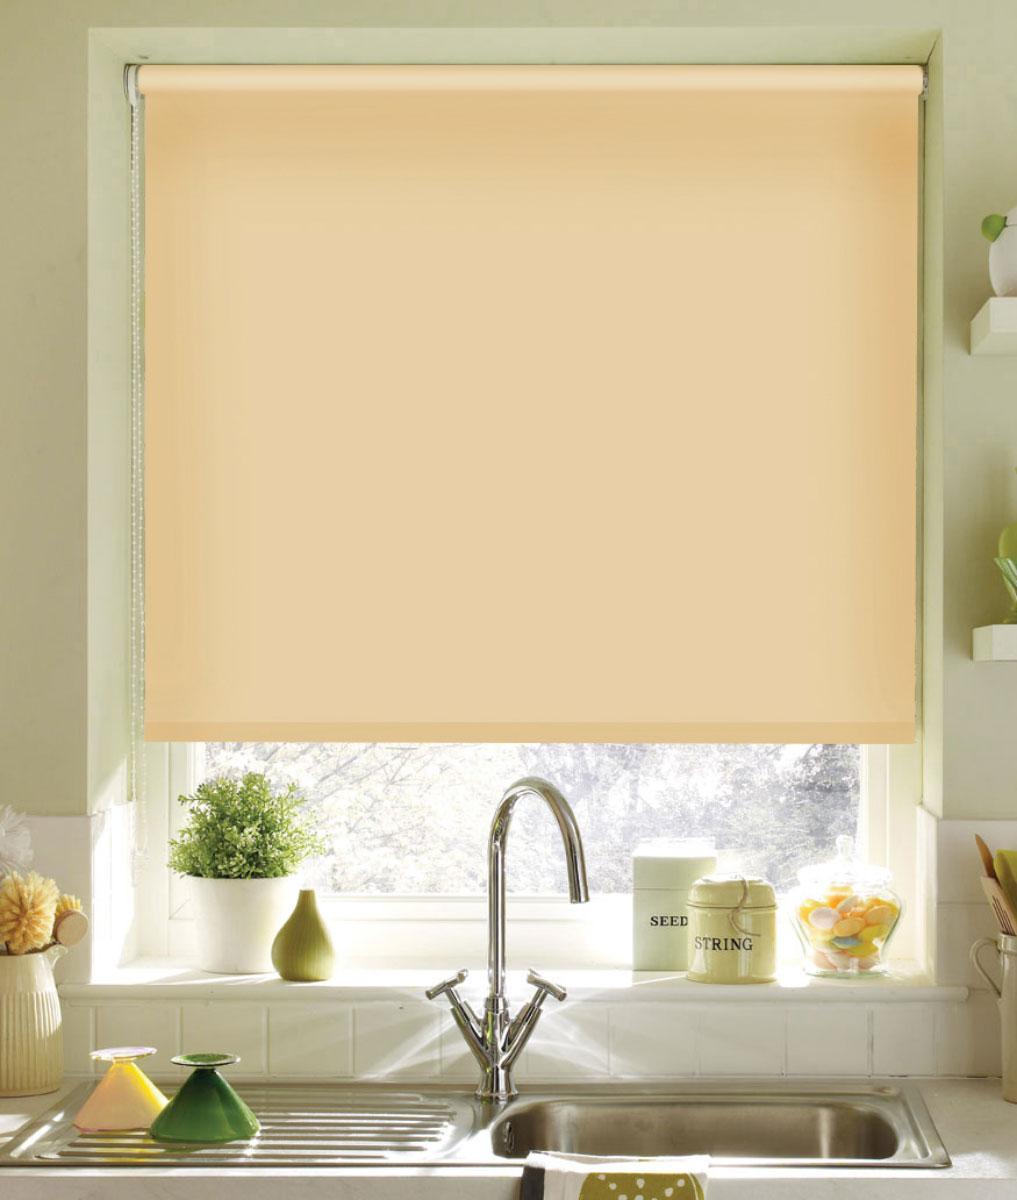 Миниролло KauffOrt 62х170 см, цвет: светлый абрикос